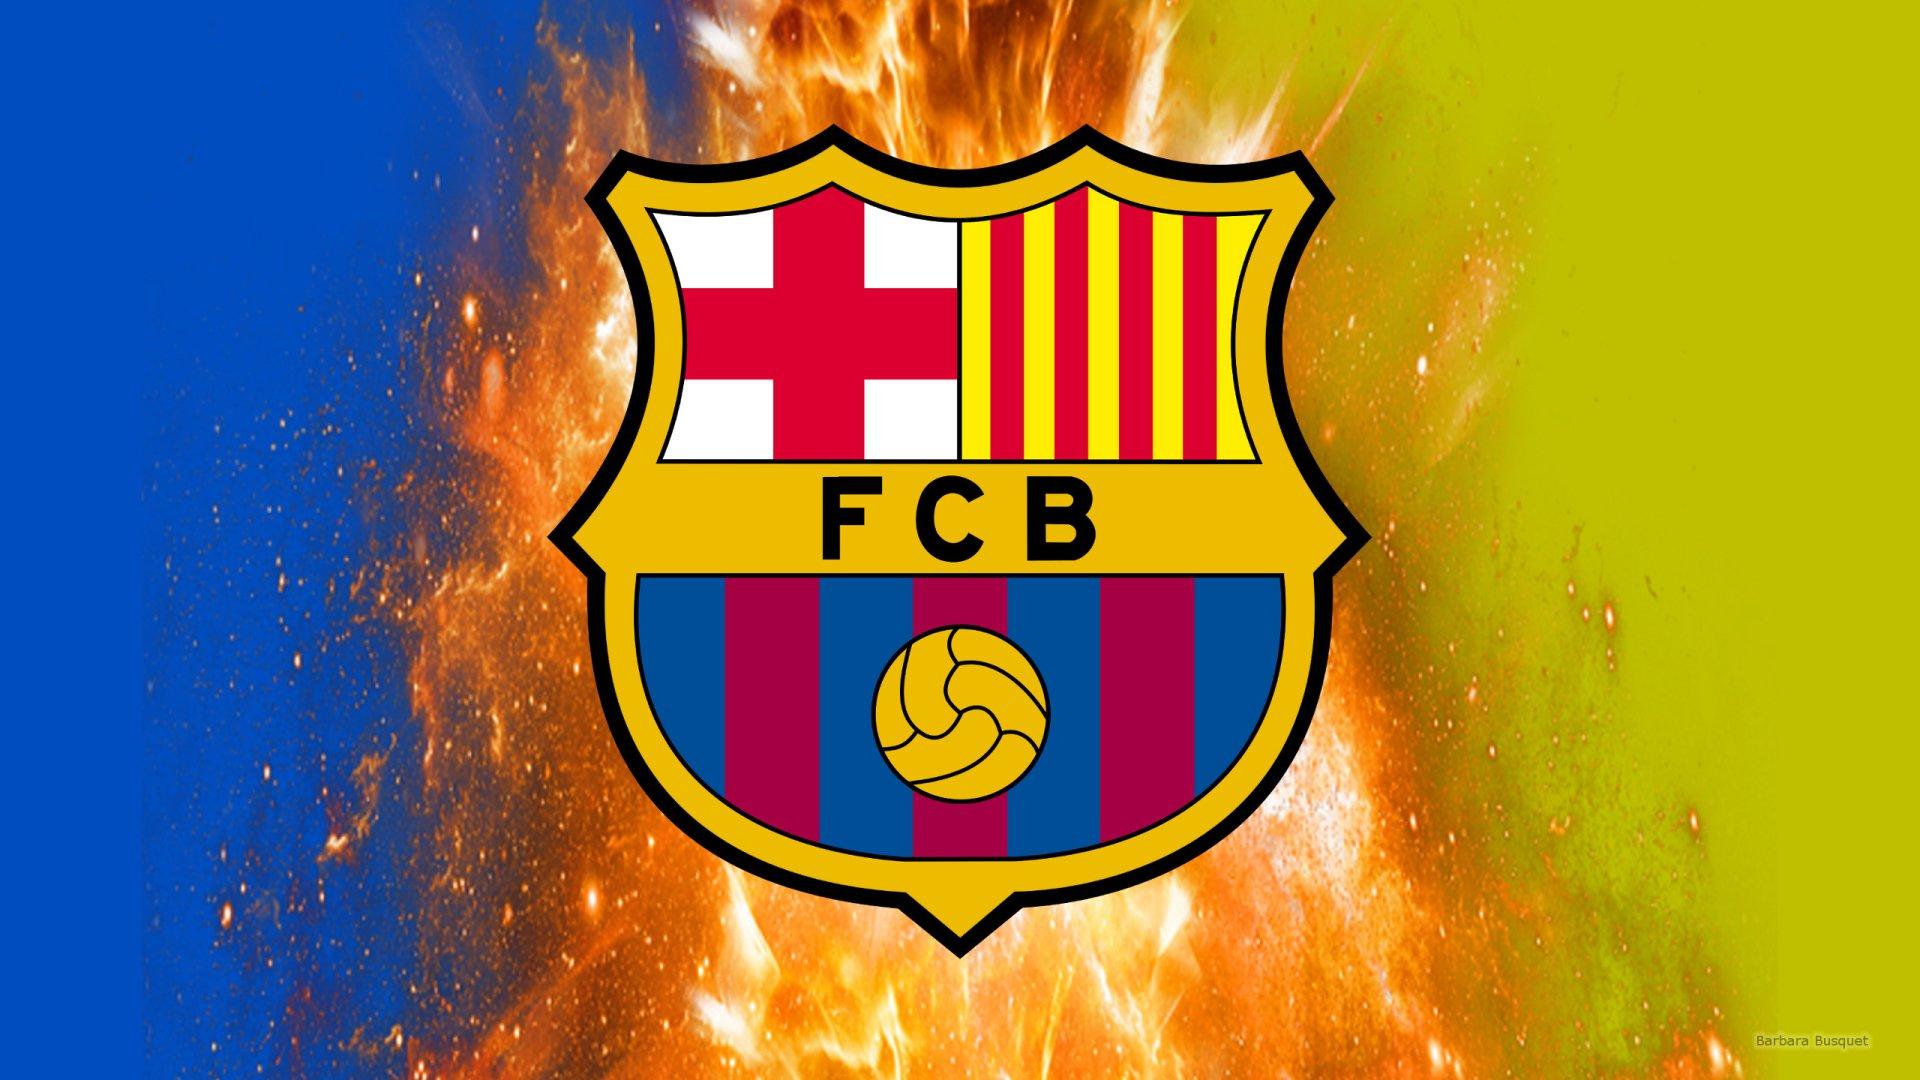 FC Barcelona Fond d'écran HD | Arrière-Plan | 2560x1440 | ID:989424 - Wallpaper Abyss